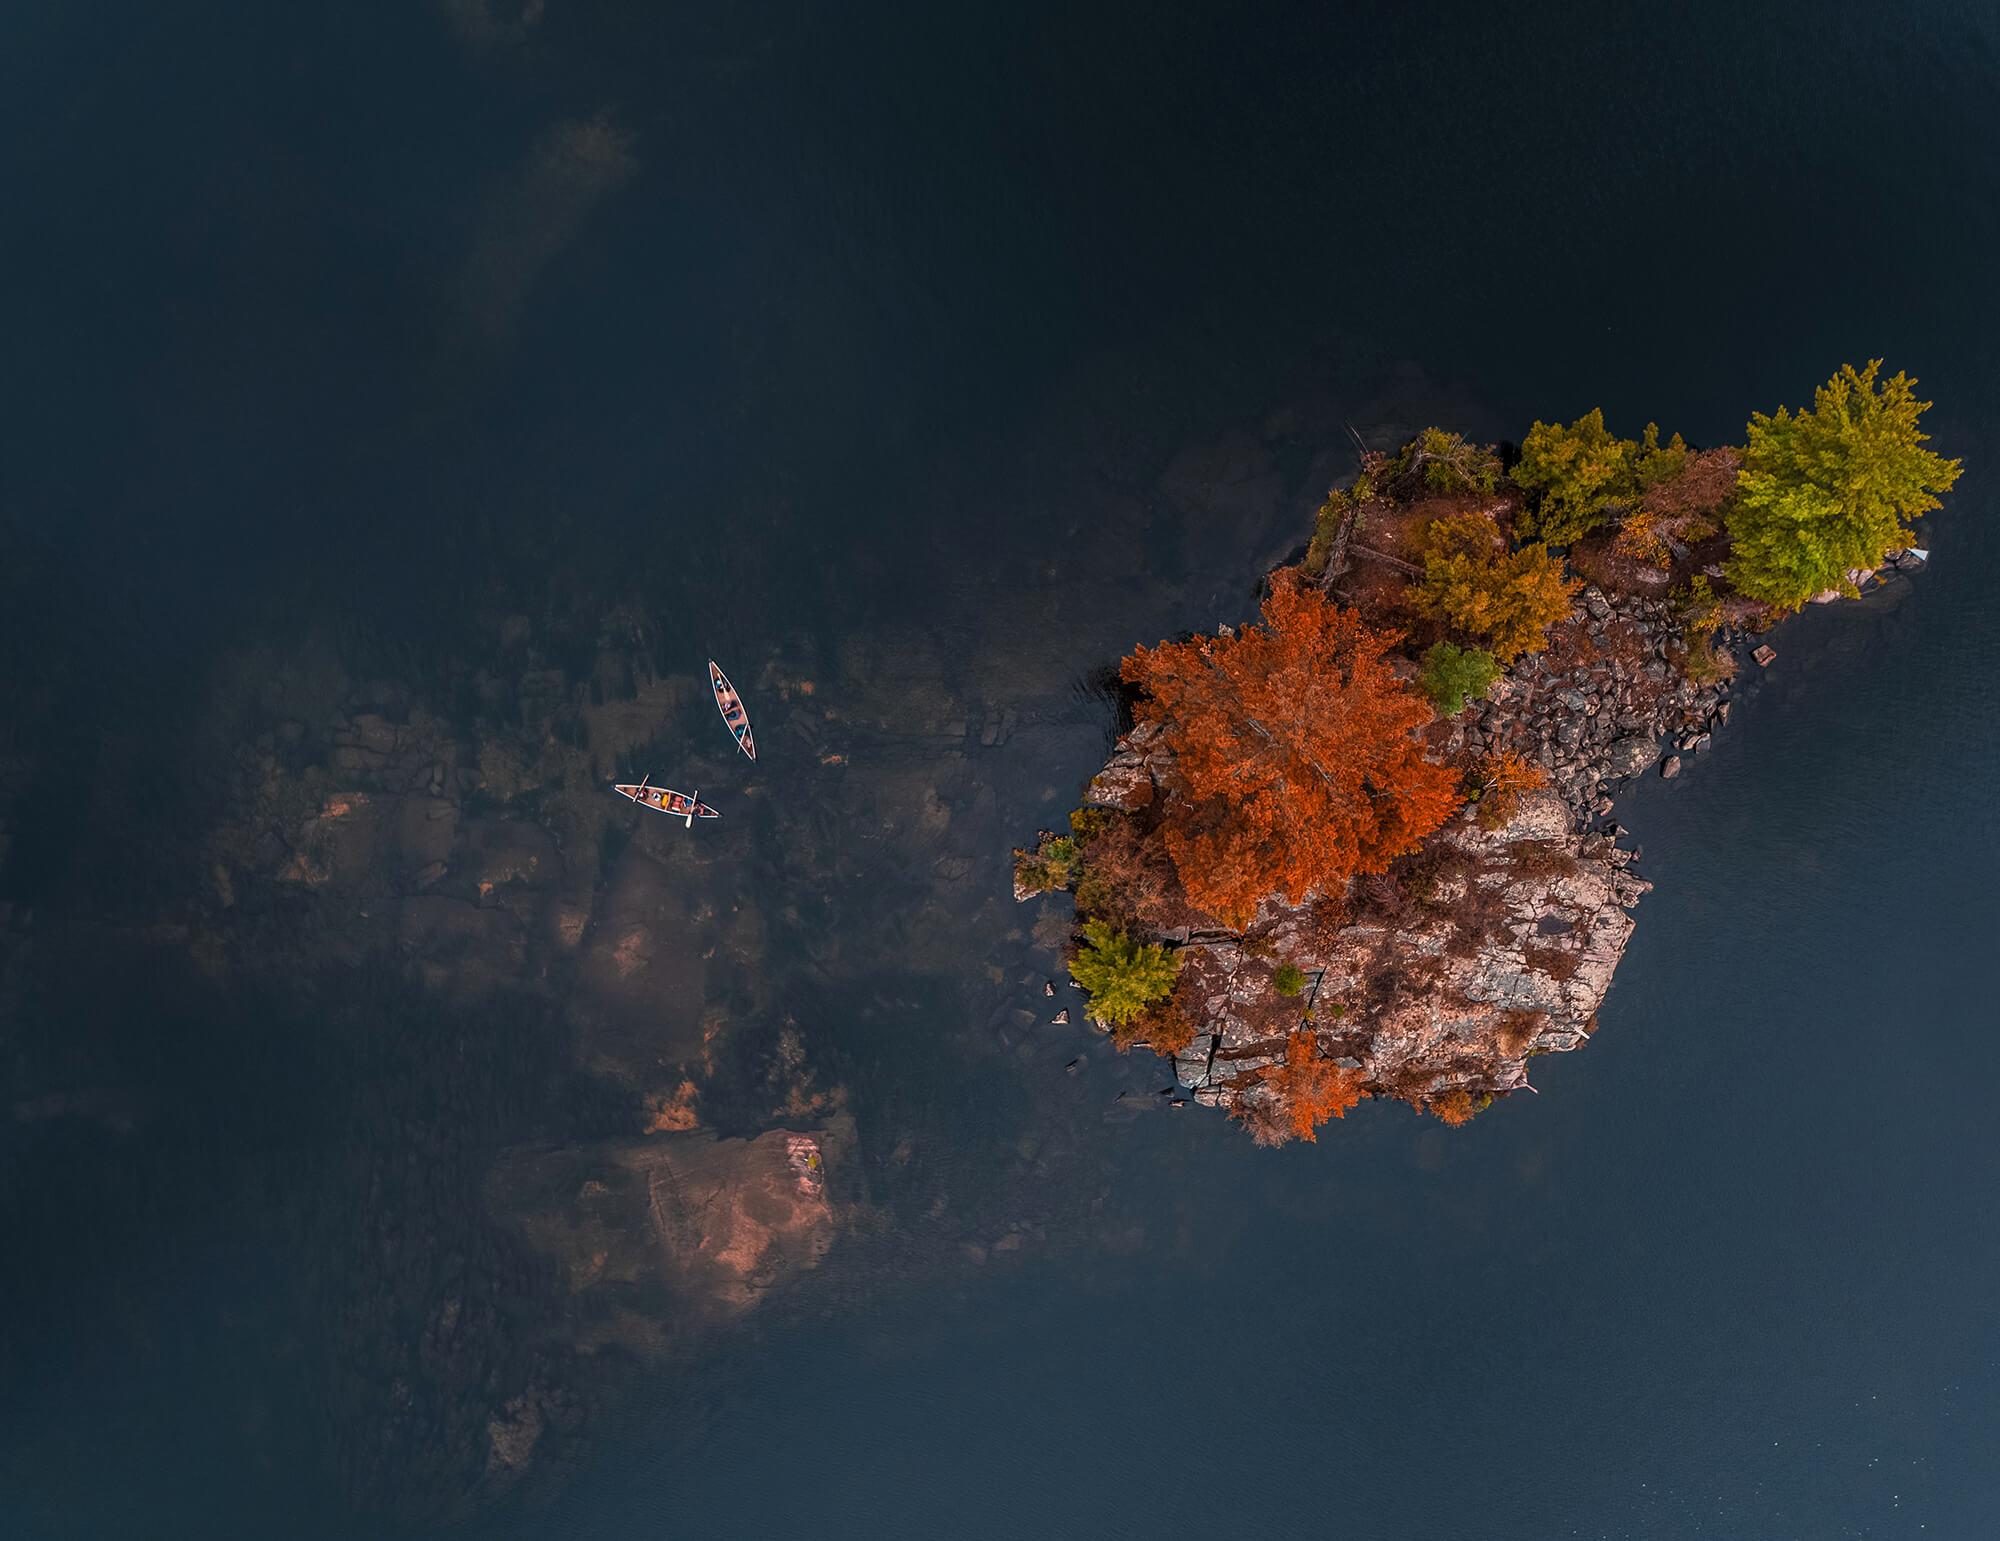 JustenSoule - Fall Paddle